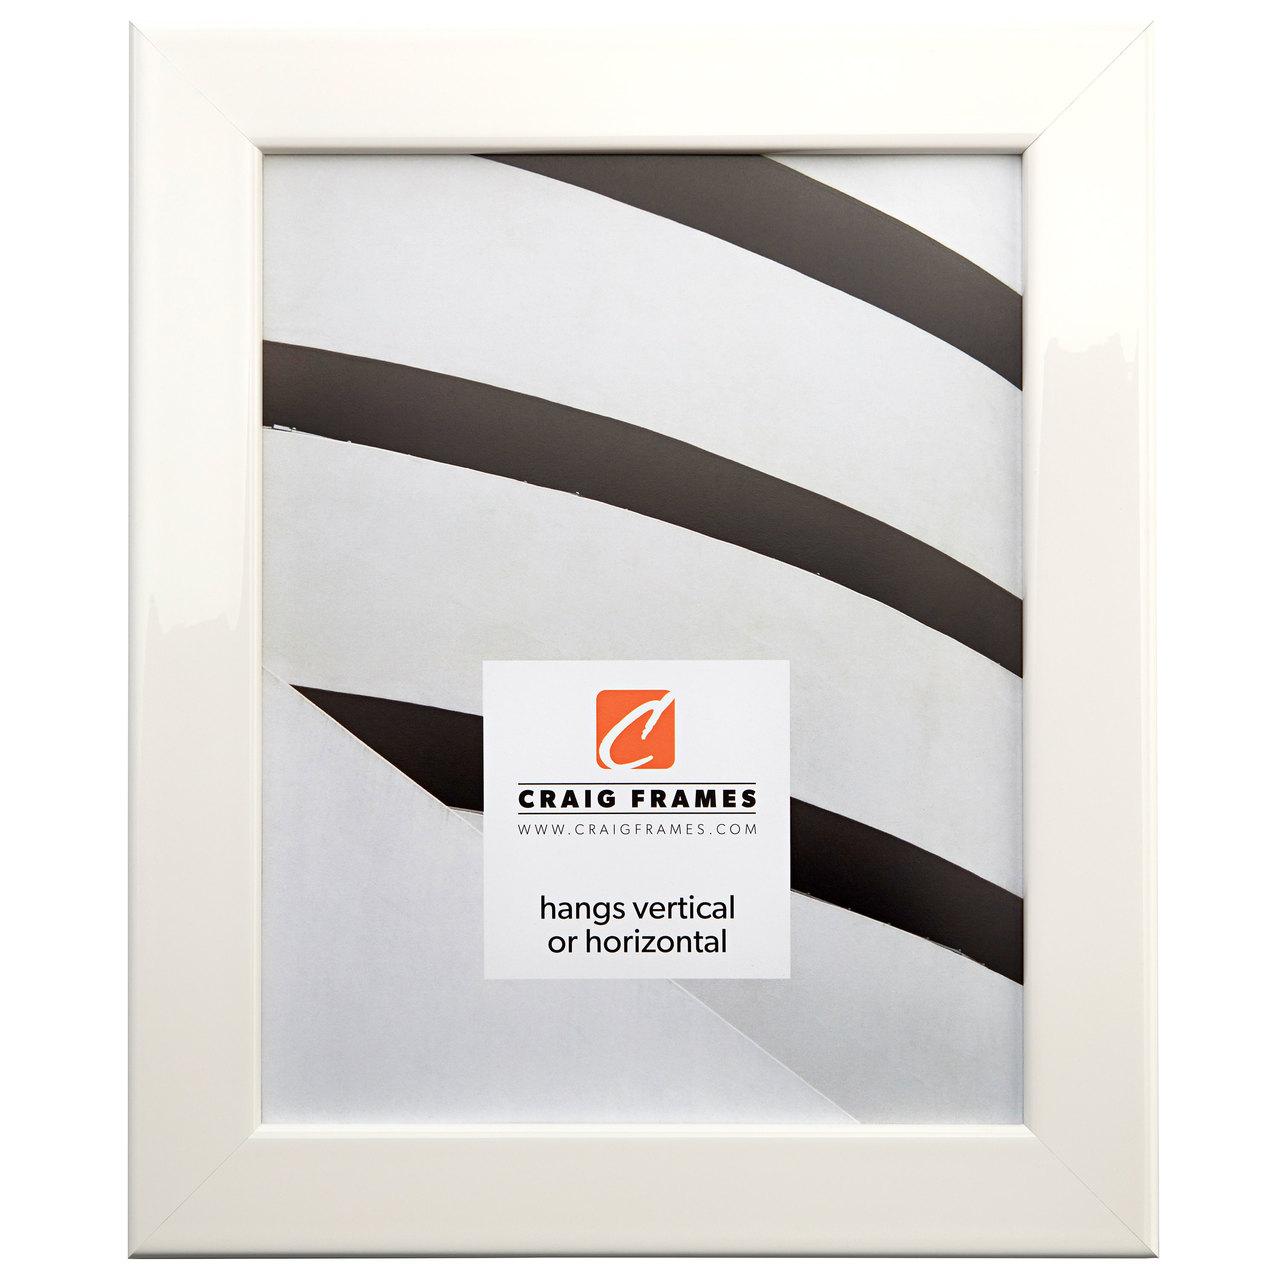 "Bauhaus 125 1.25"", Liquid White Picture Frame"